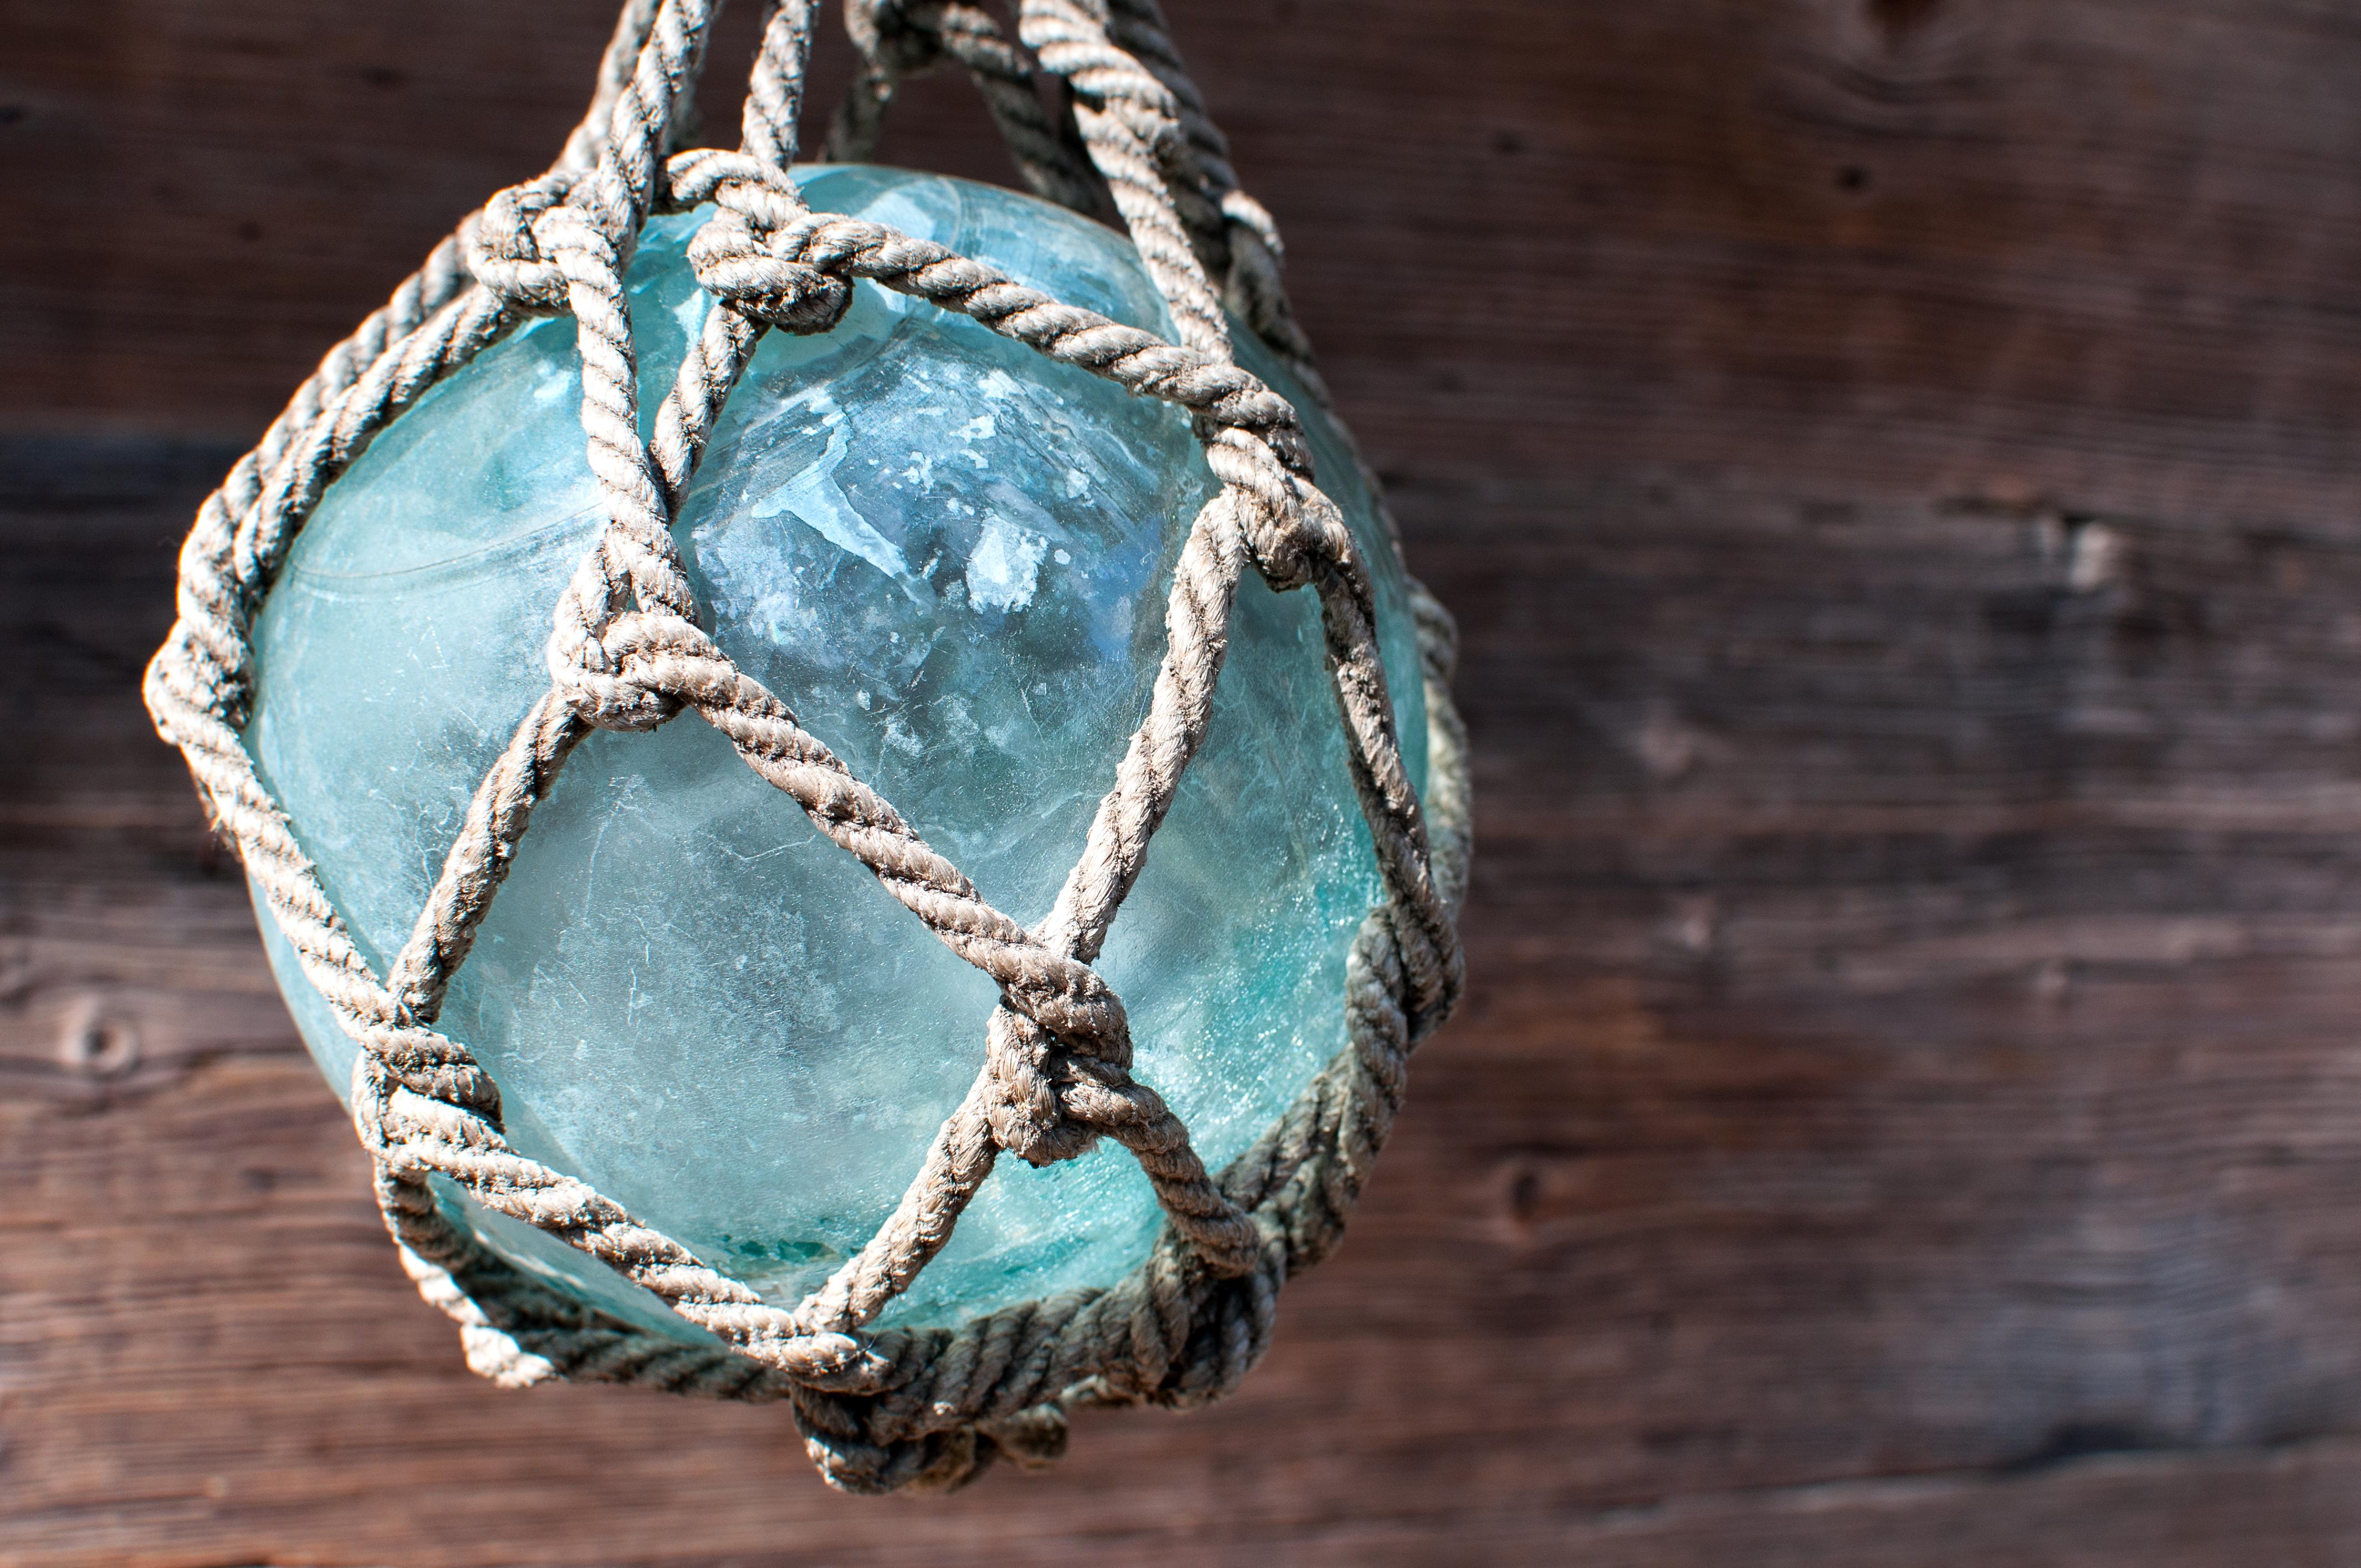 Glass Ball Float